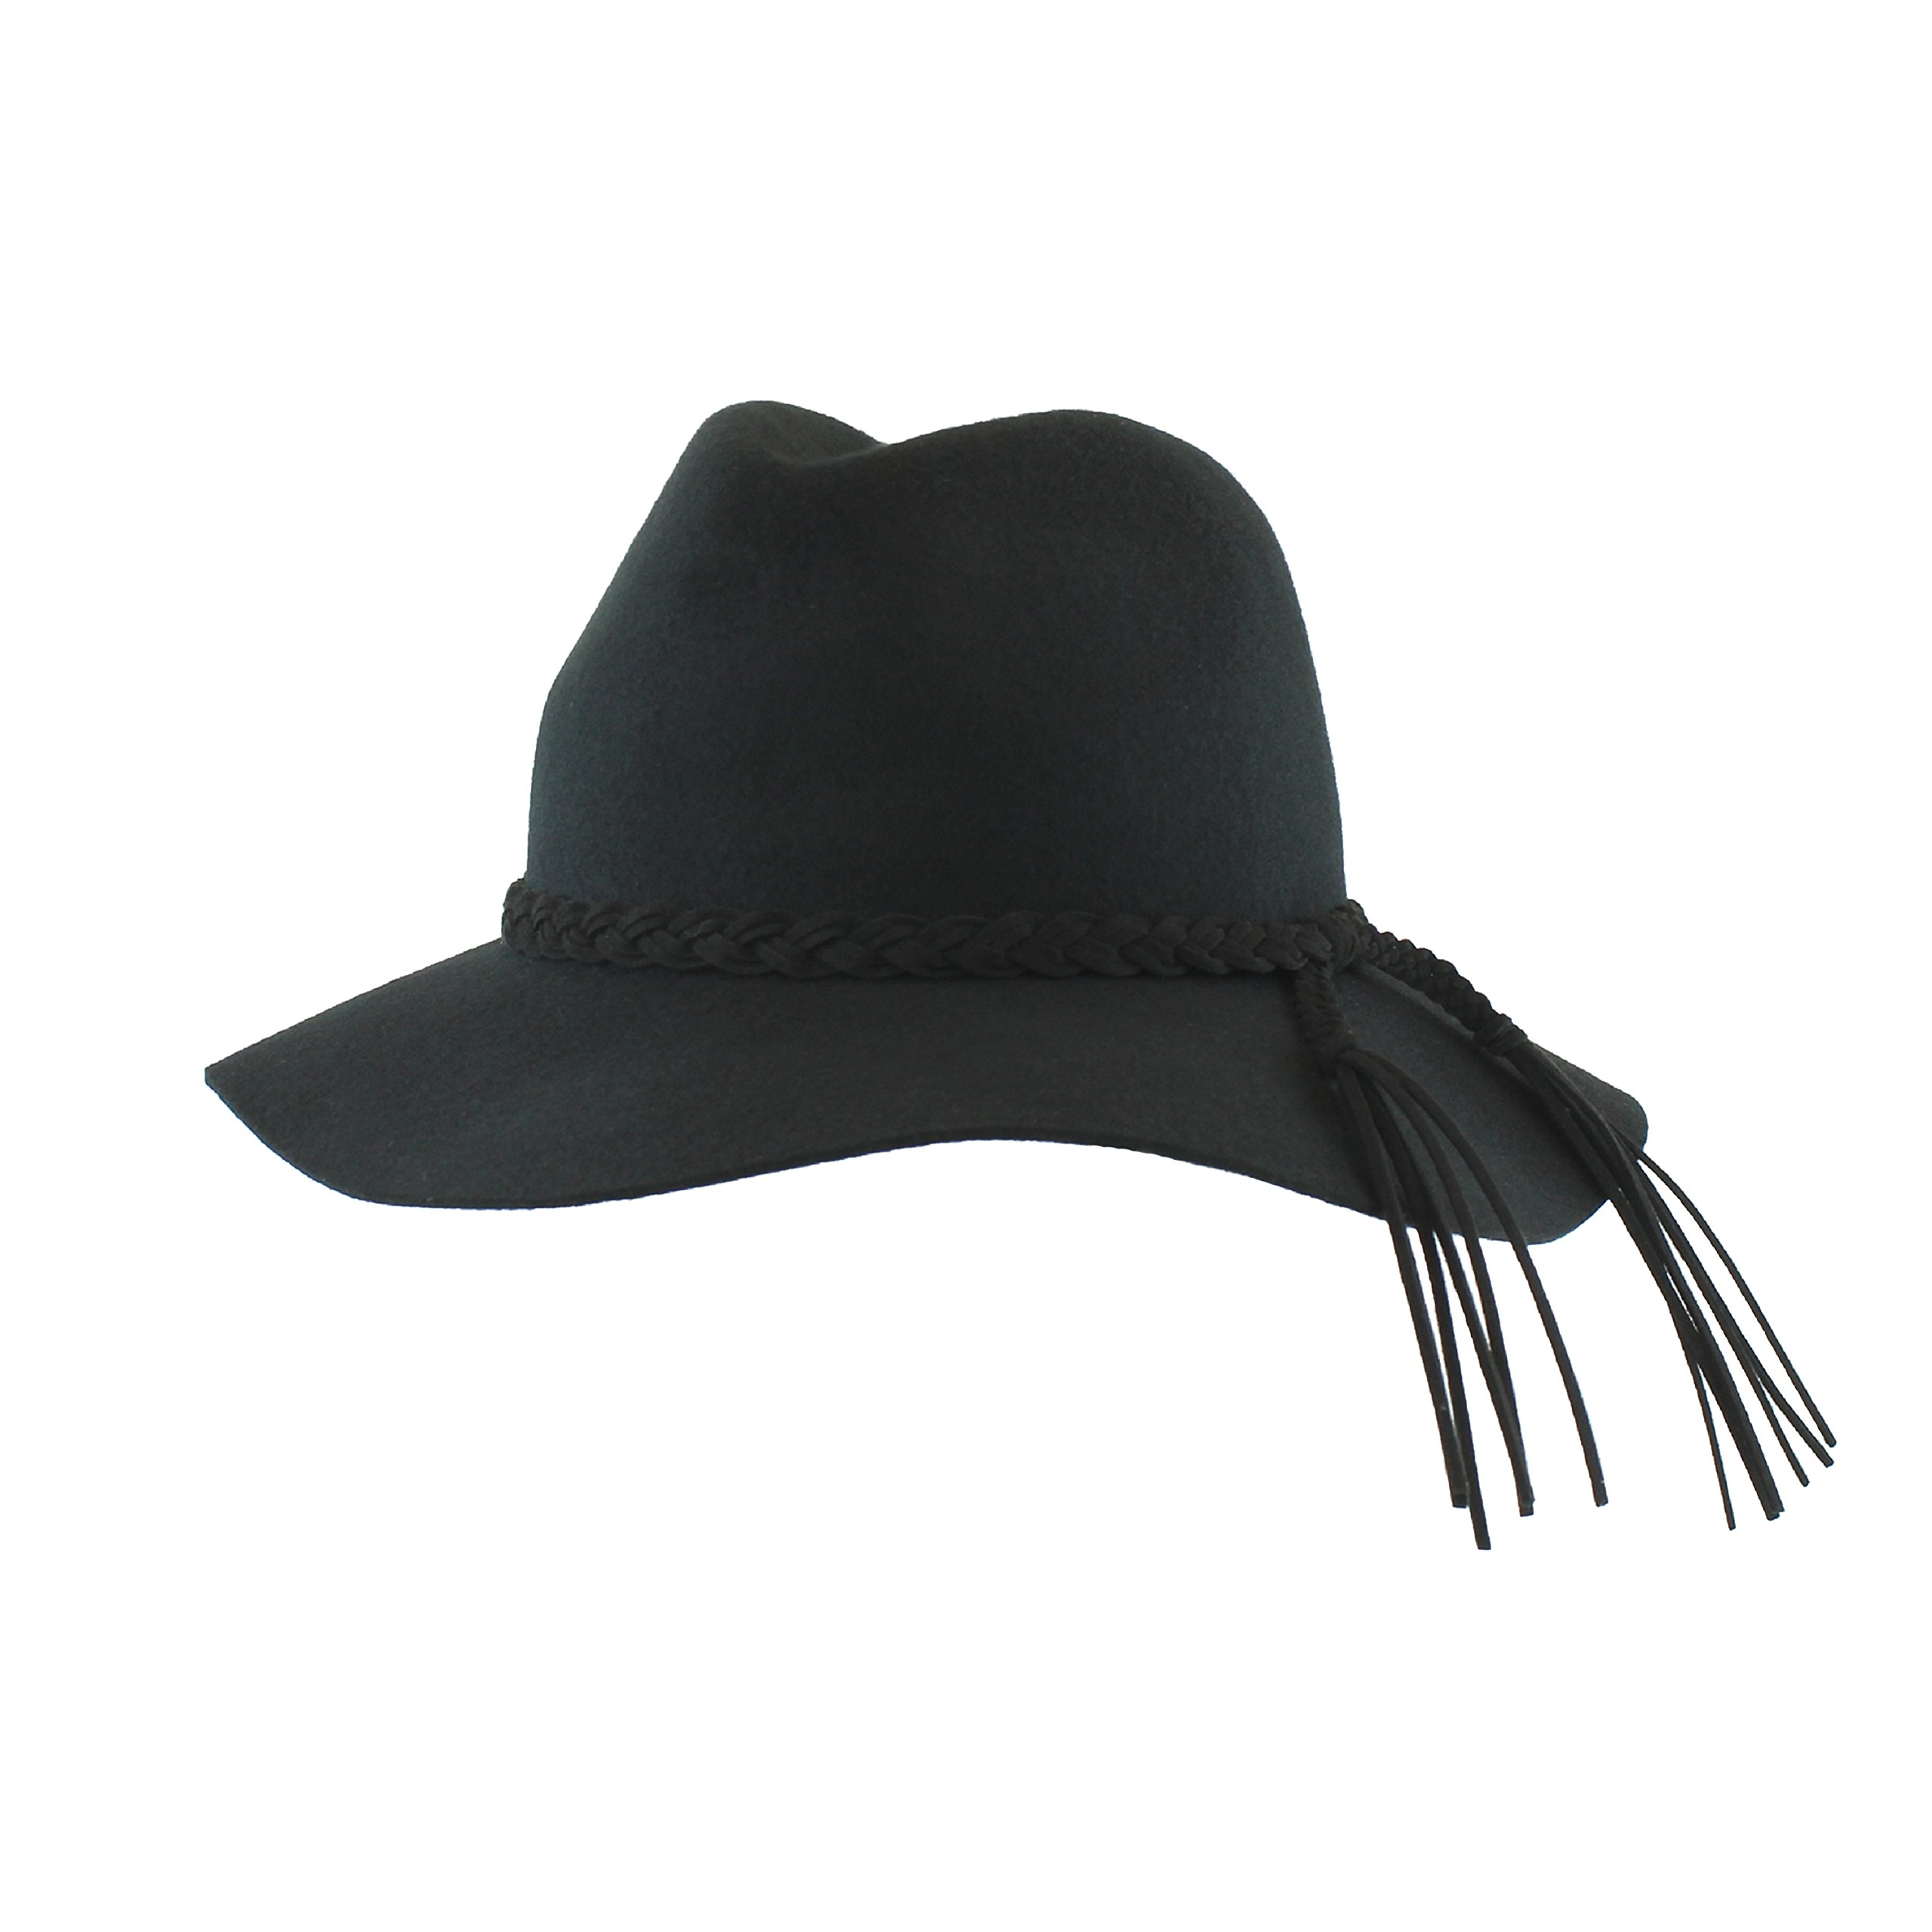 FLH Black Wool Floppy brimmed Panama Style Fedora Hat w/Braided Fringe Band – Winter